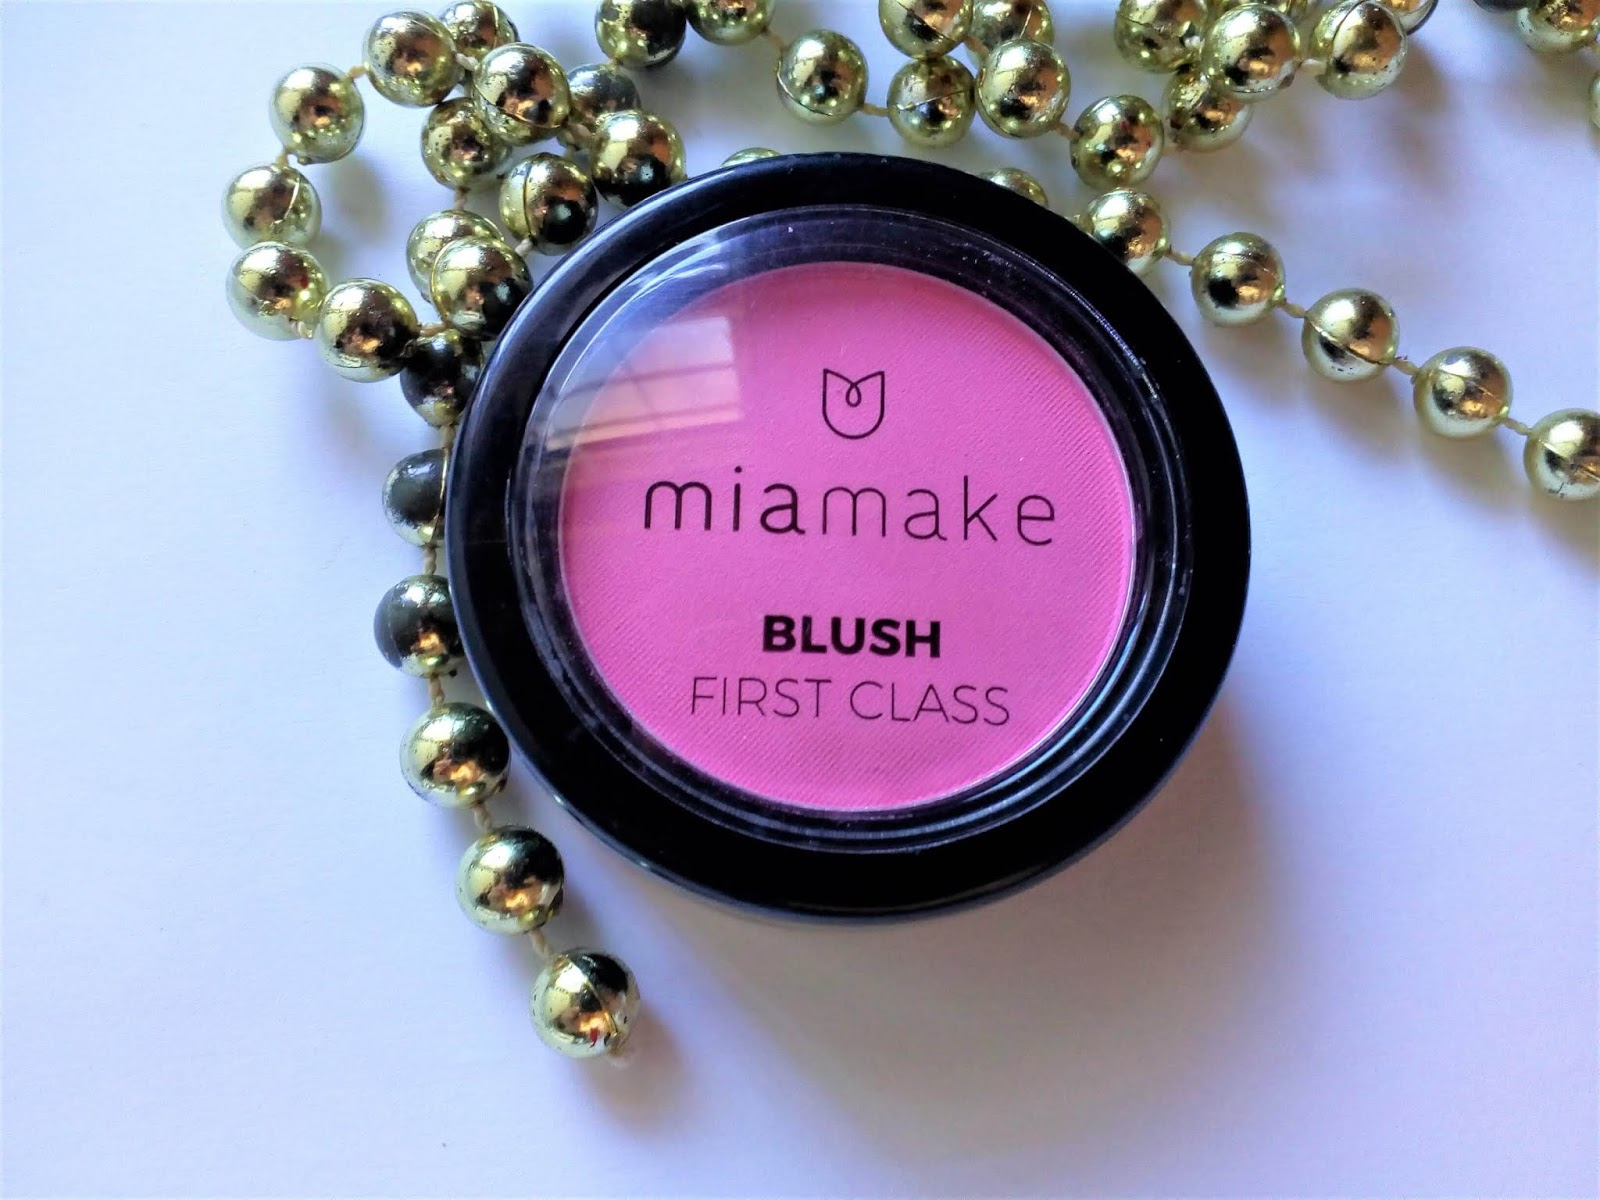 Resenha: Blush First Class da Mia Make